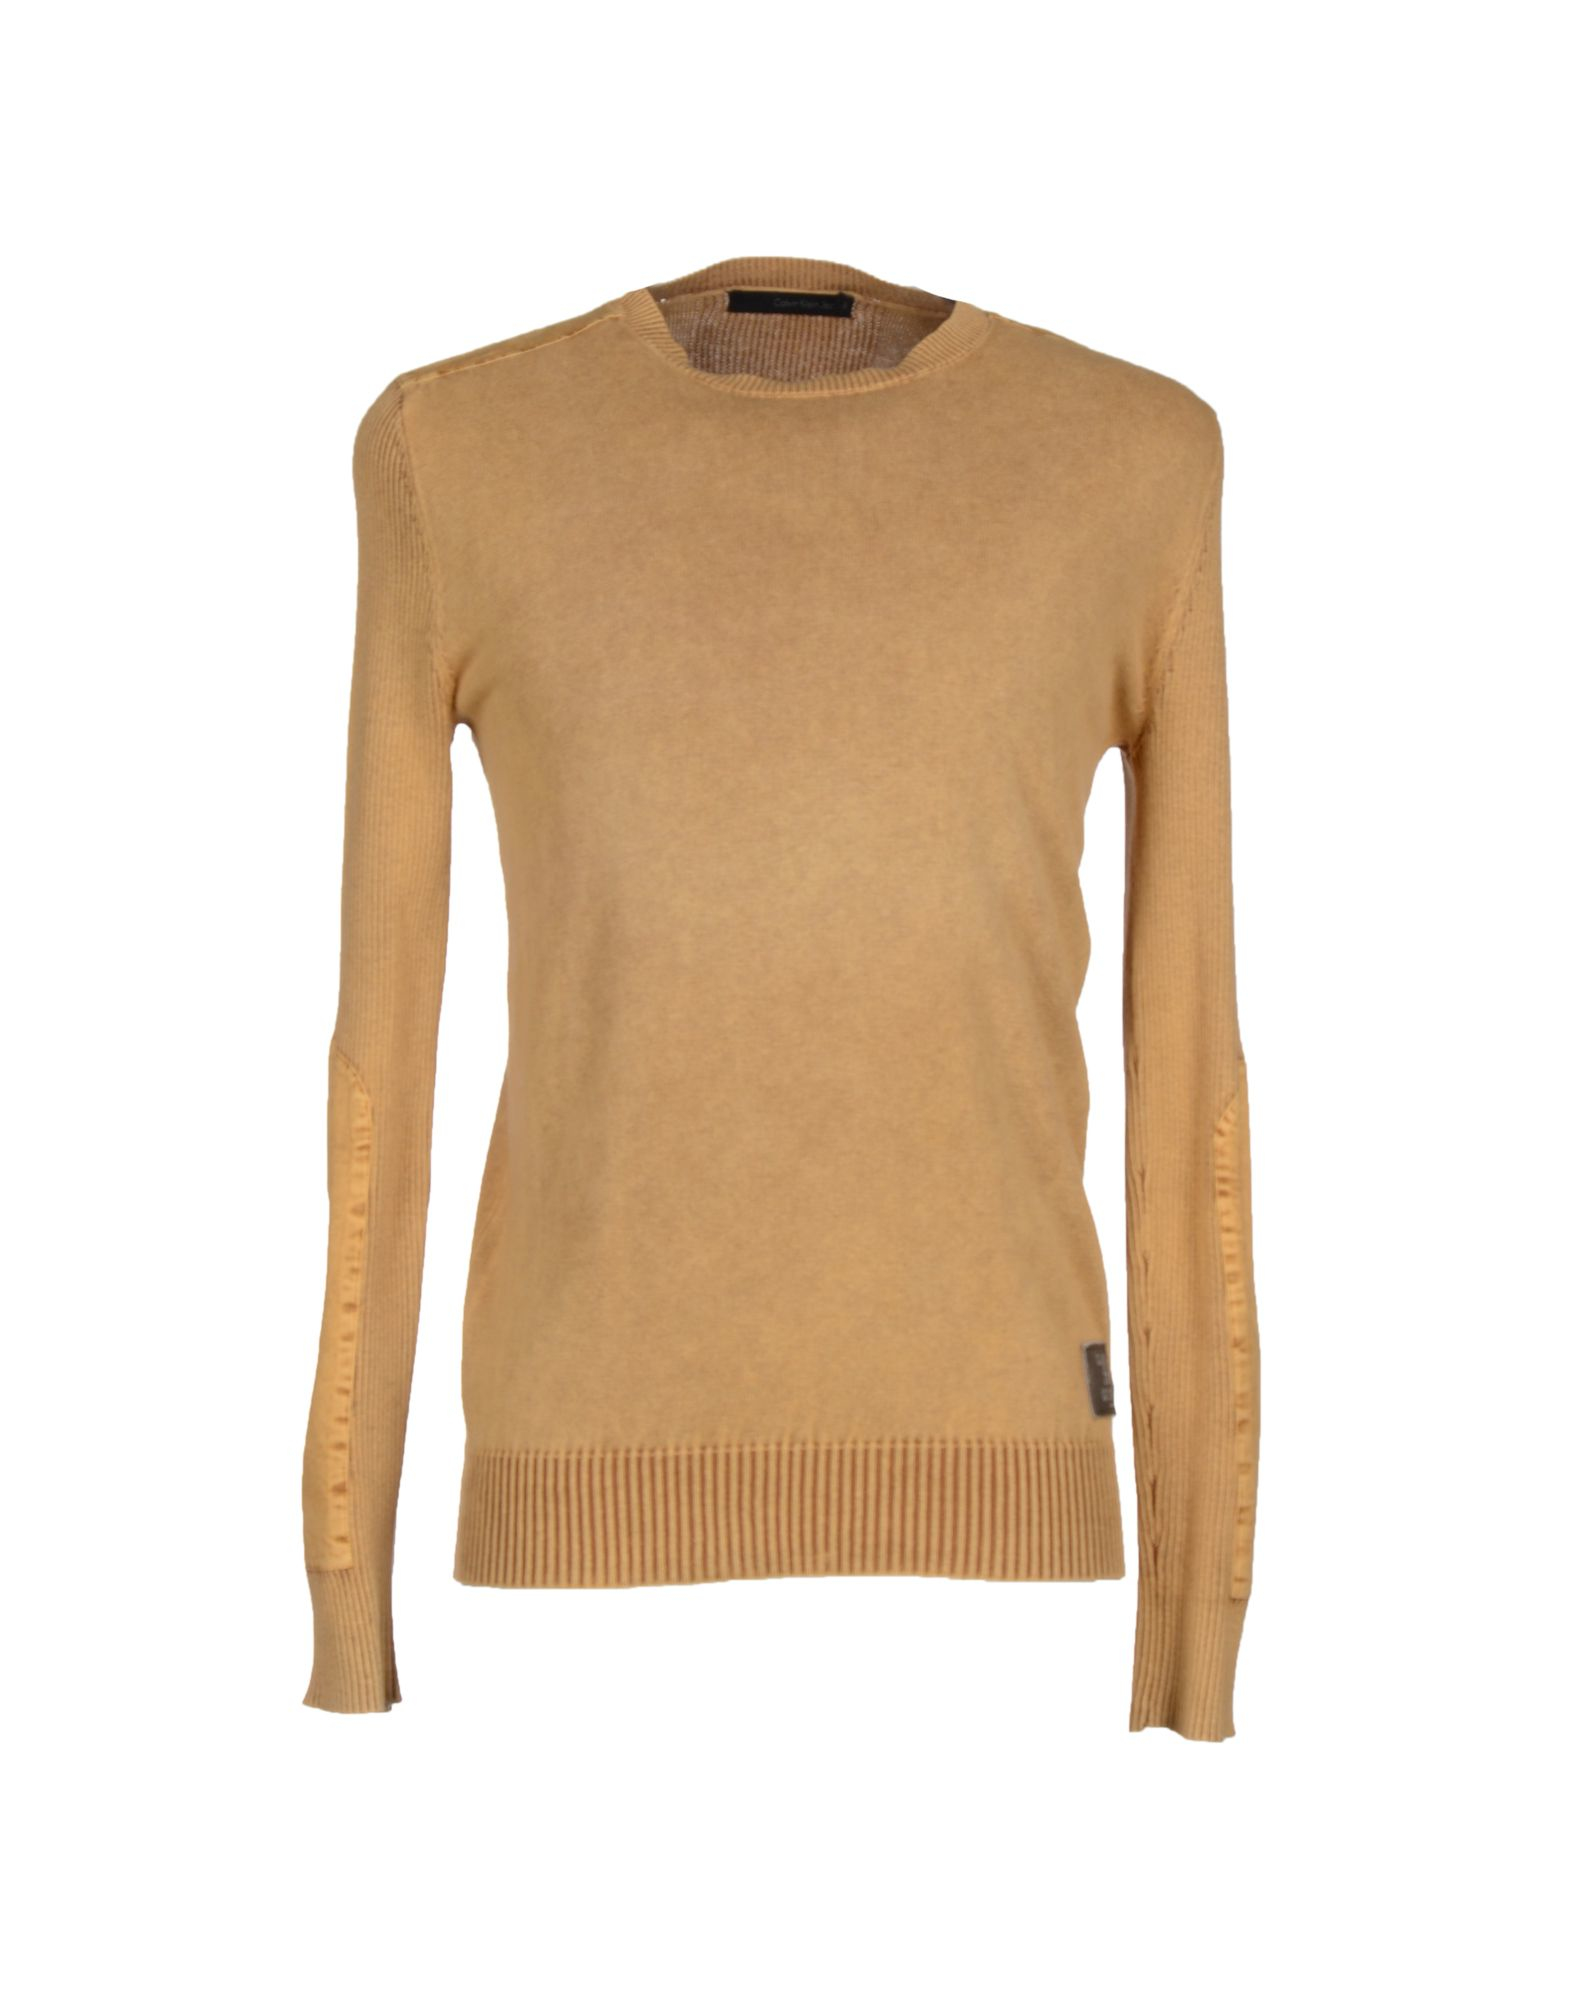 calvin klein jeans sweater in beige for men ocher lyst. Black Bedroom Furniture Sets. Home Design Ideas